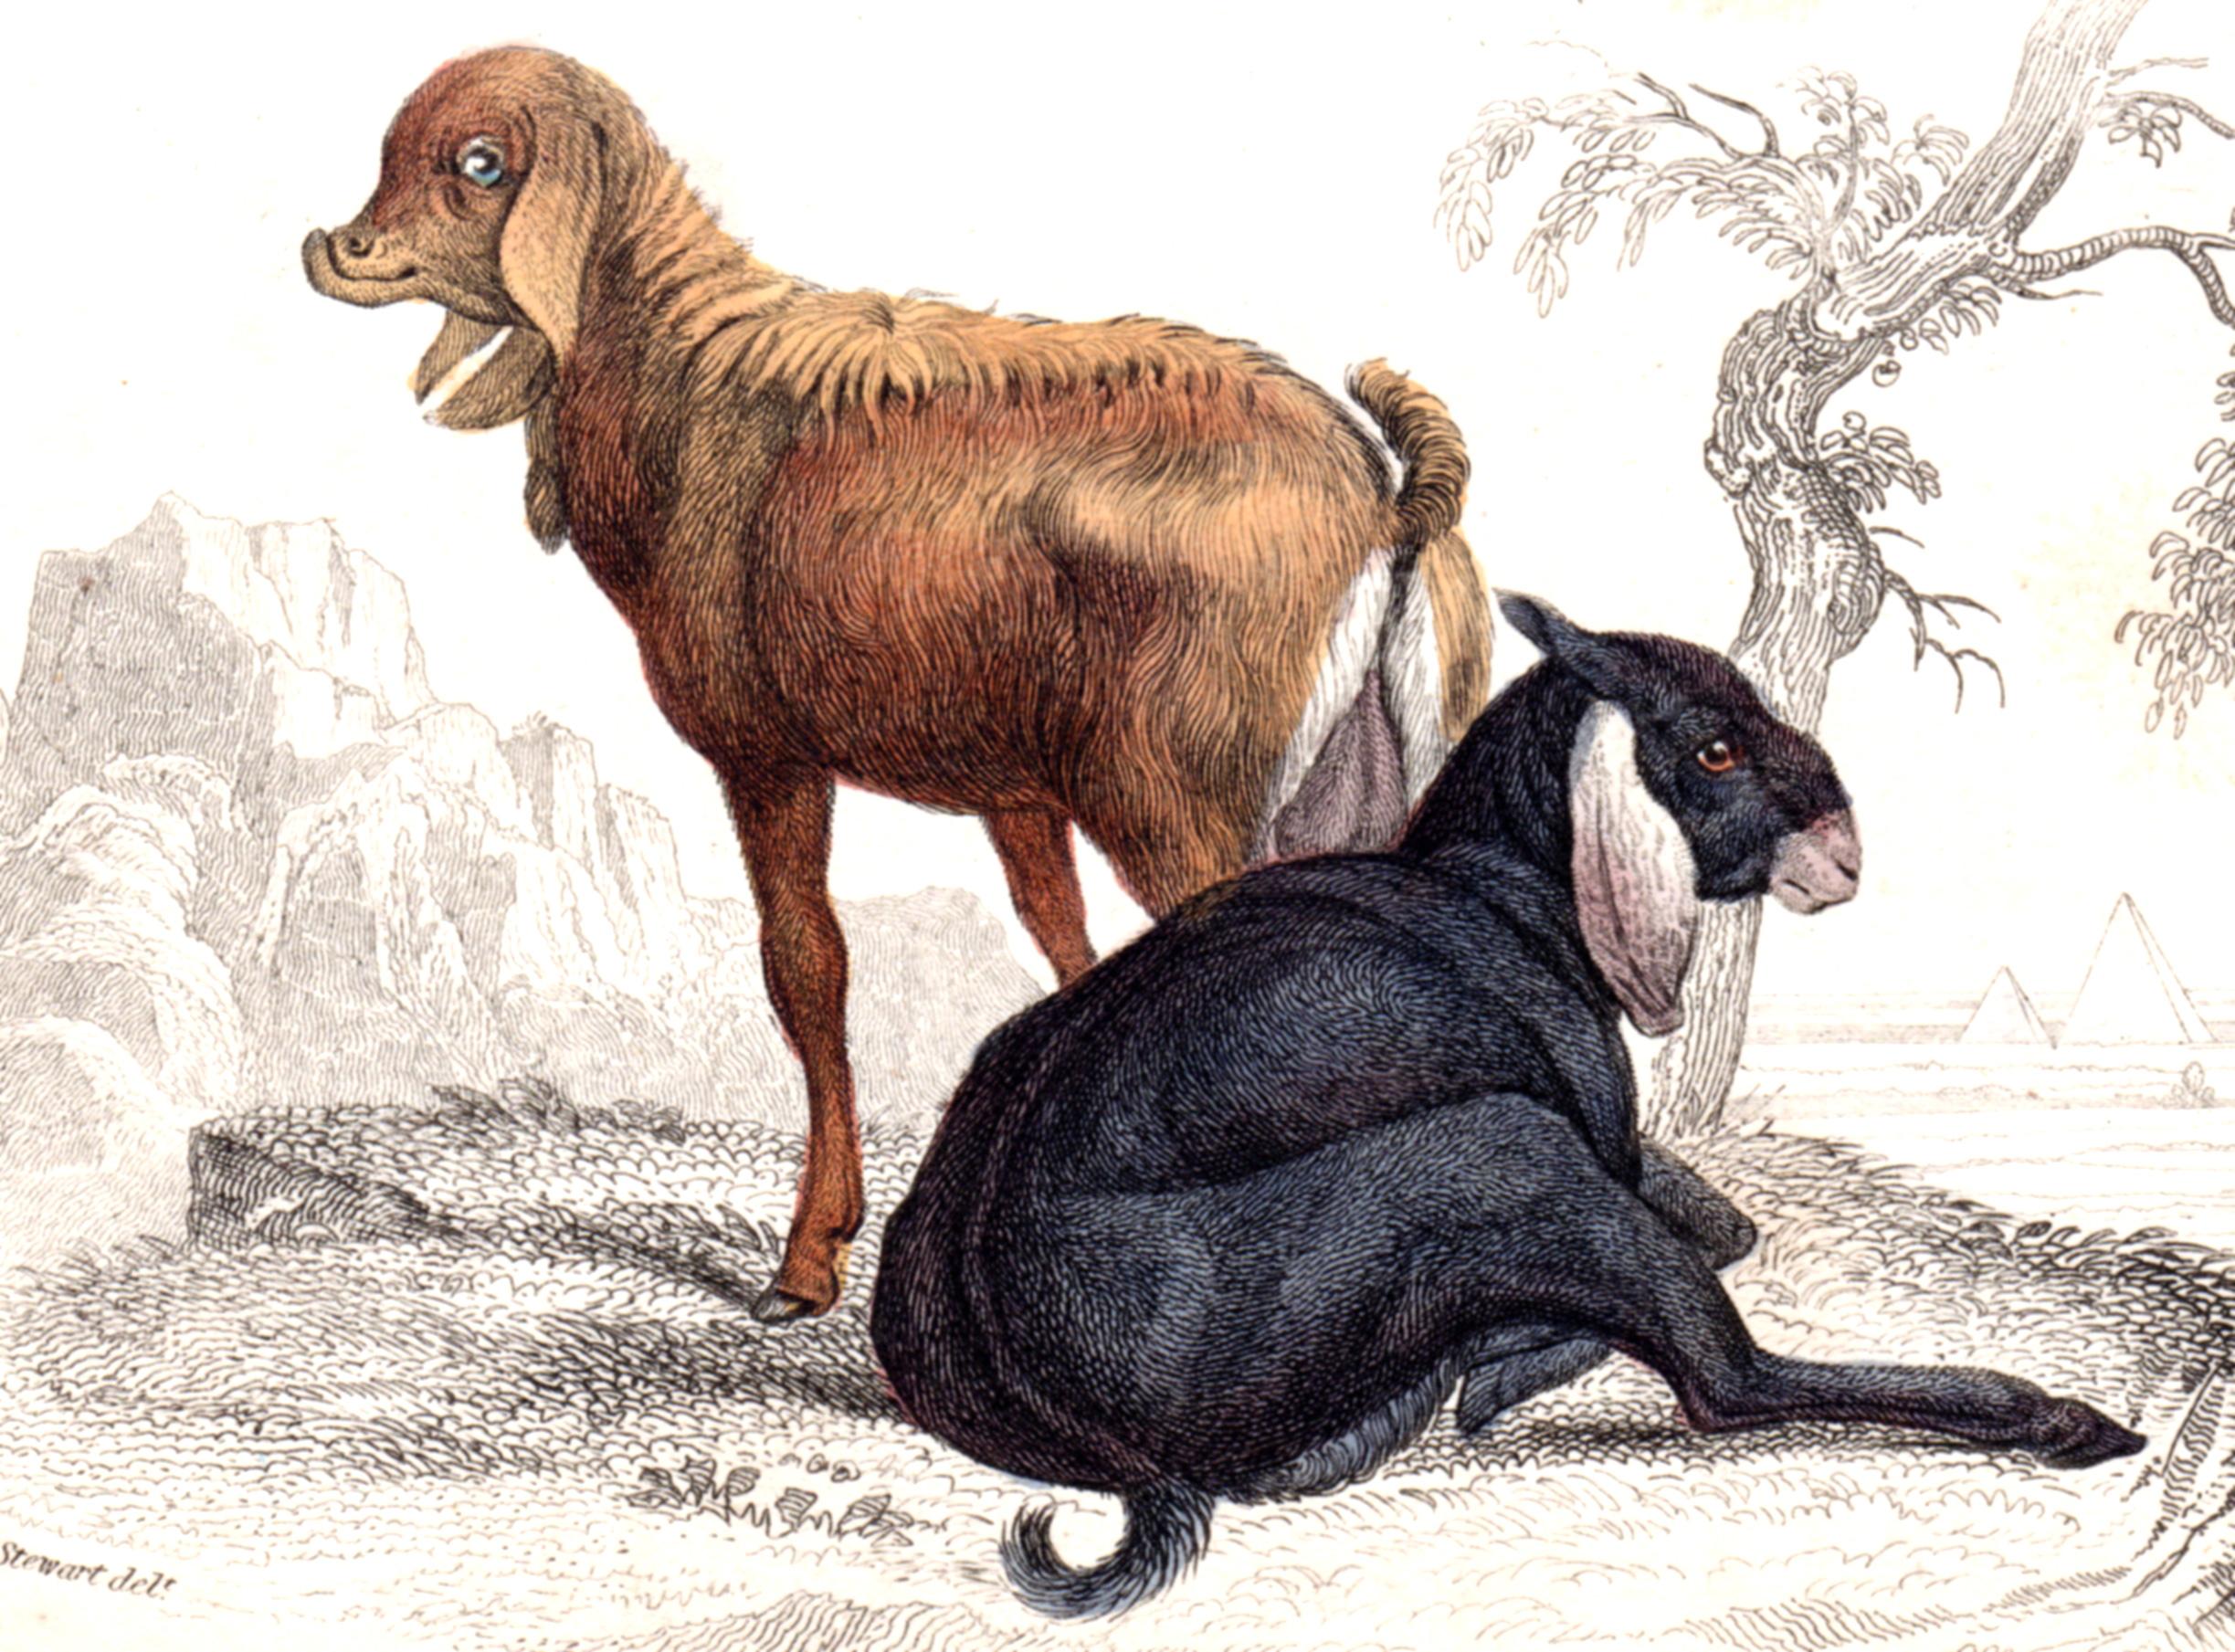 Jardine, Sir Wm / Lizars, Wm – Sheep, Goats, Cattle, etc.